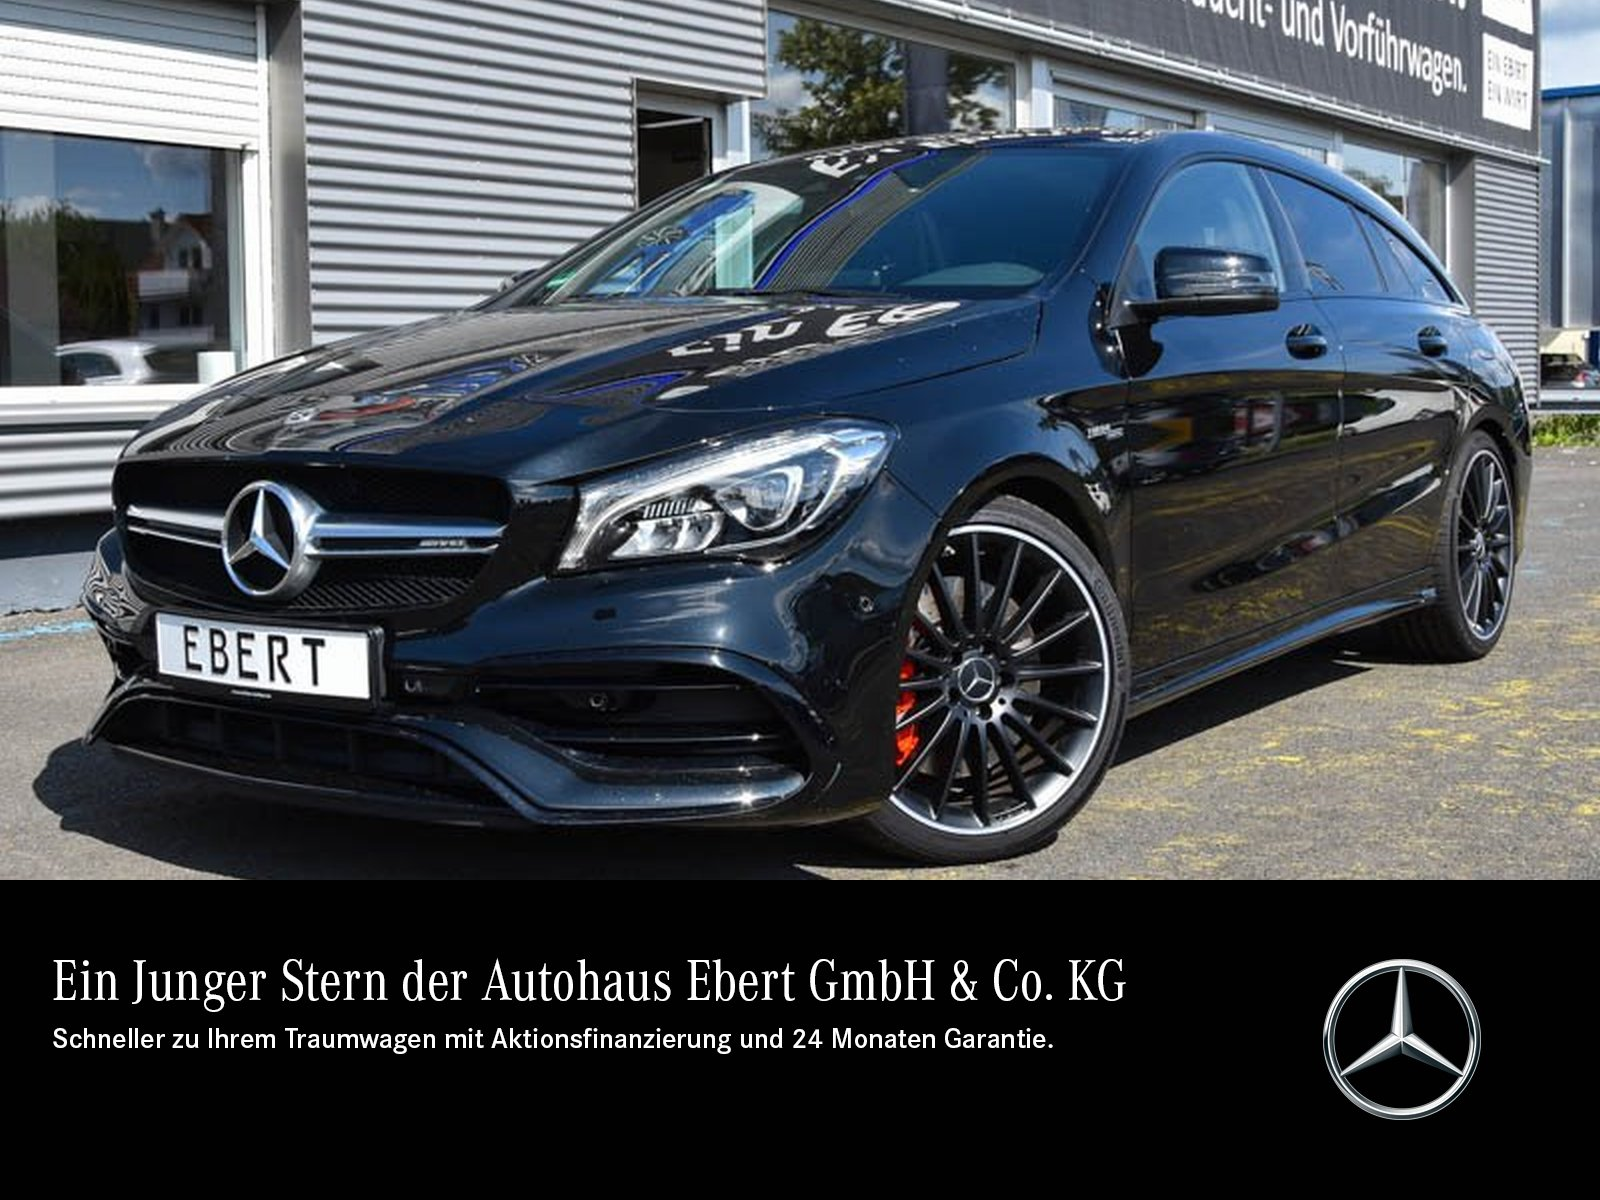 Mercedes-Benz CLA 45 AMG SB 4M DRIVER'S+COMAND+NIGHT+LED+PSD, Jahr 2018, Benzin